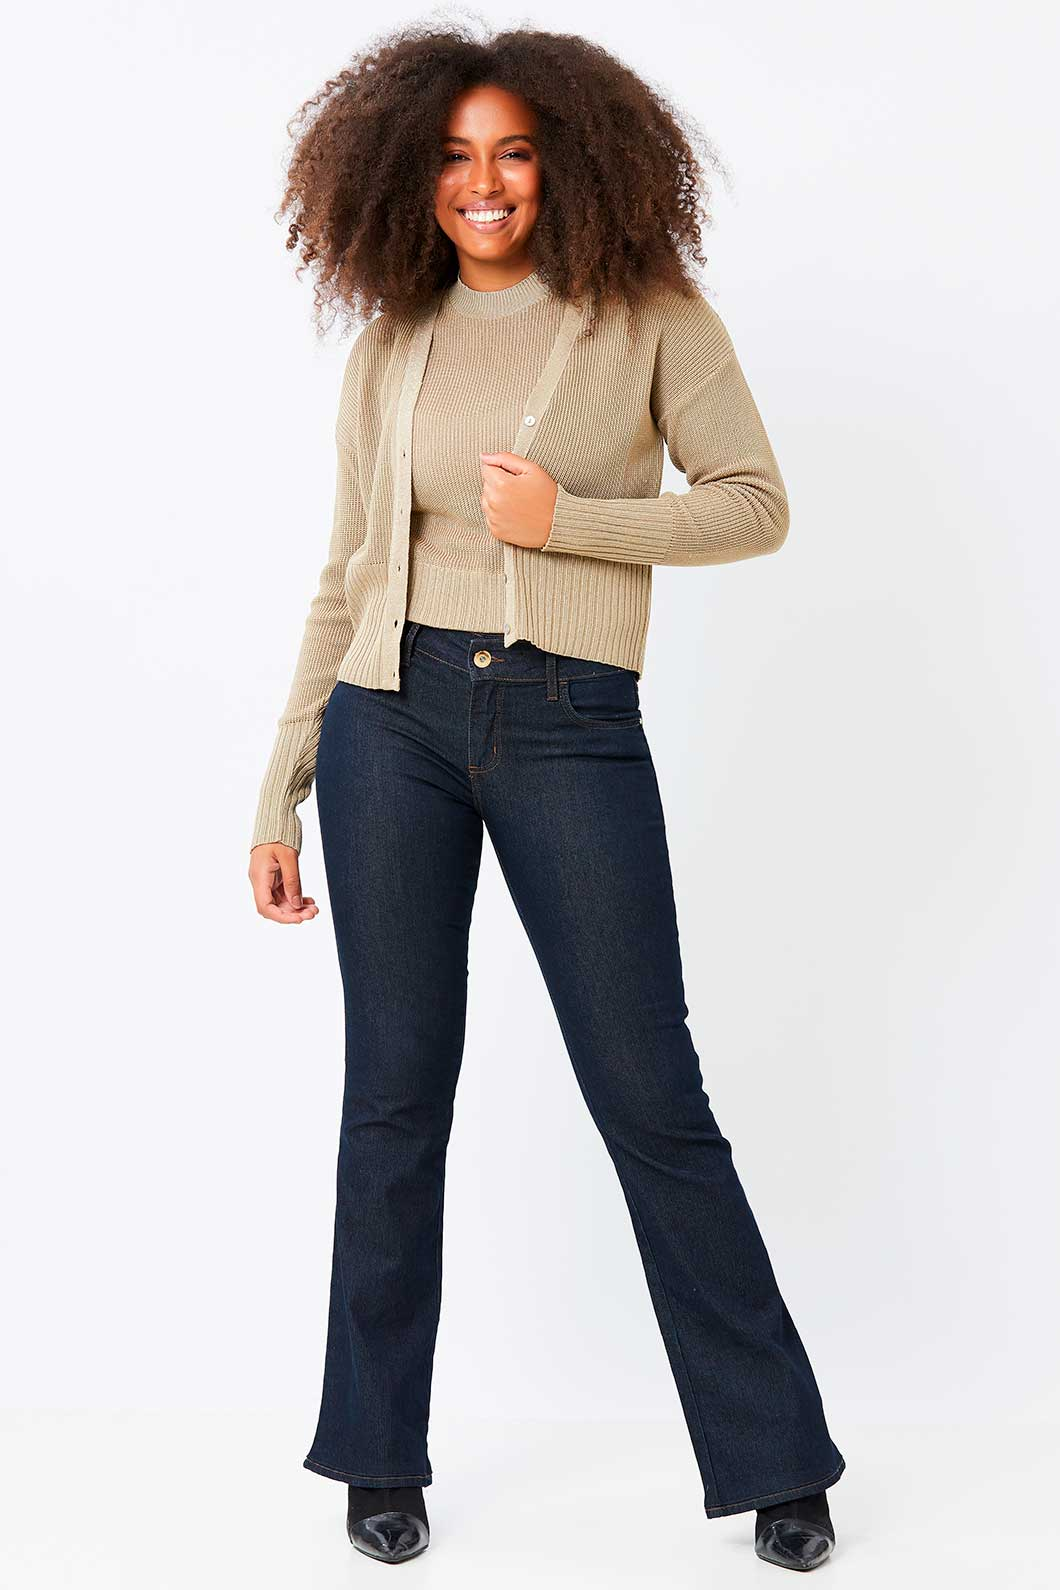 Conjunto Ralm  twinset de tricot - Dourado